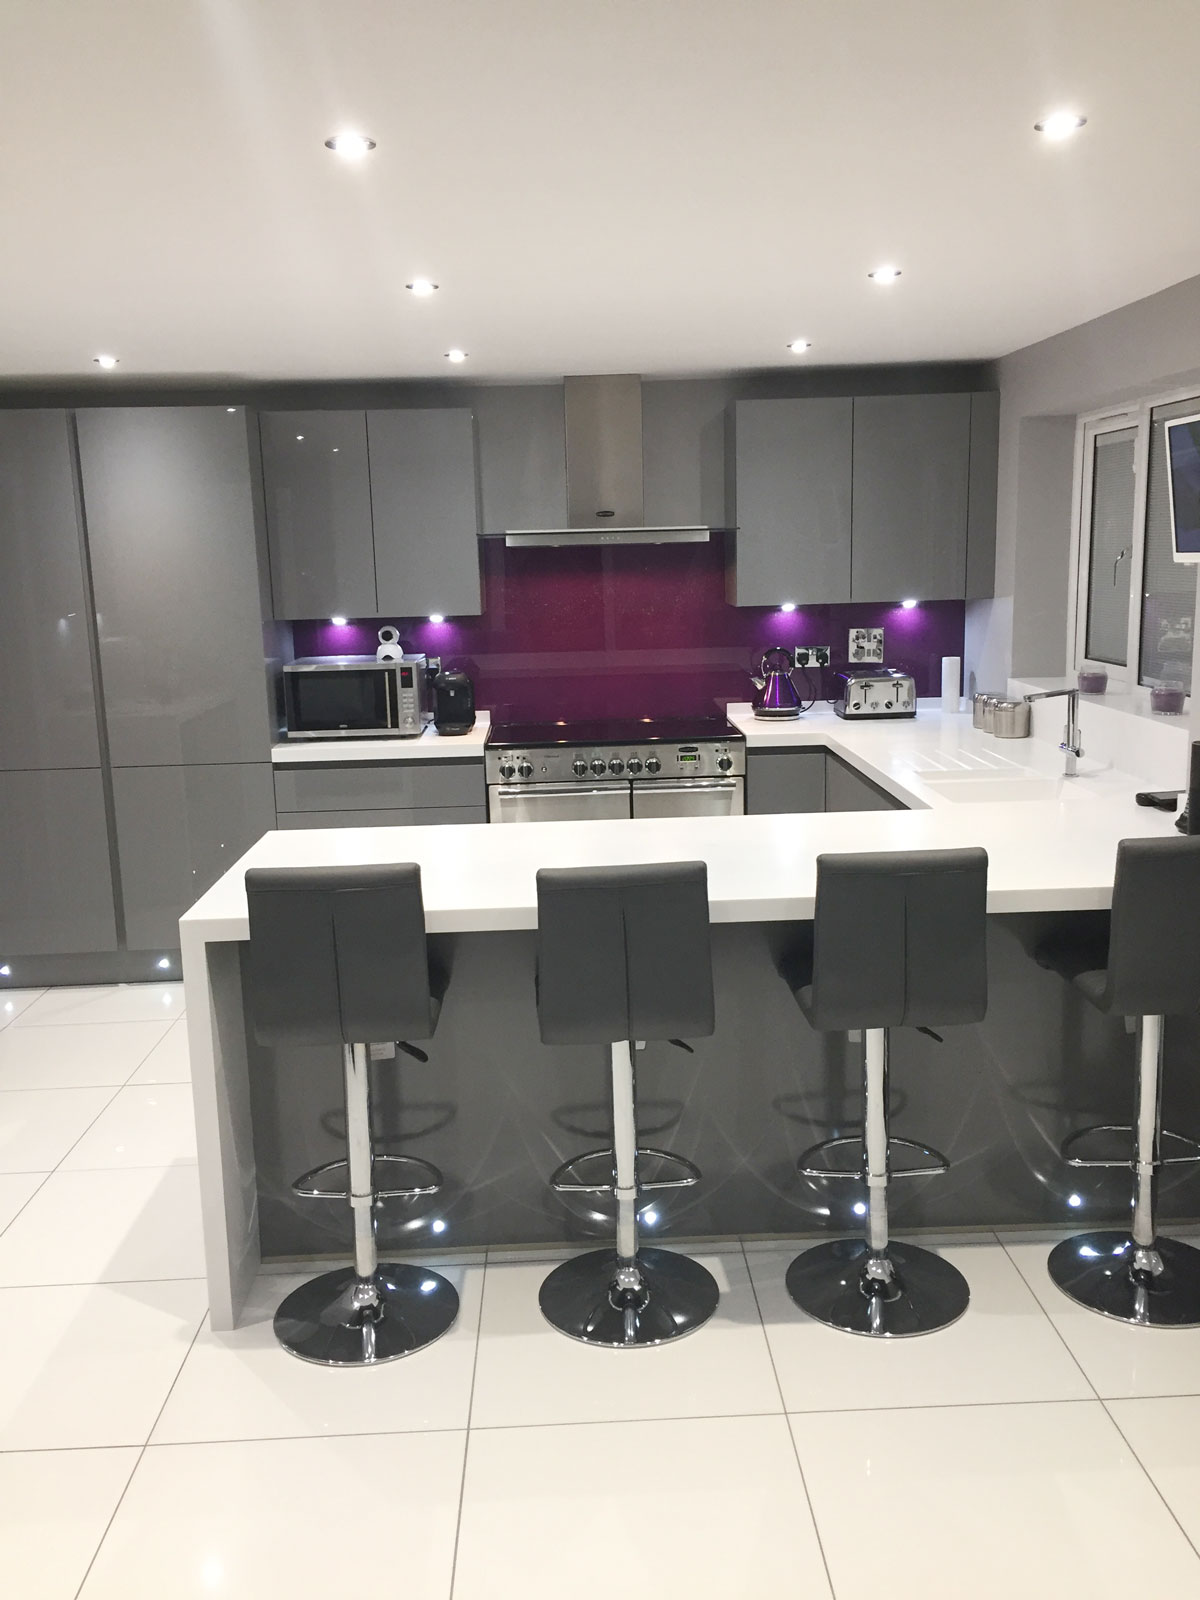 STUBBINGTON - Statement kitchen and utility | Taps and ...